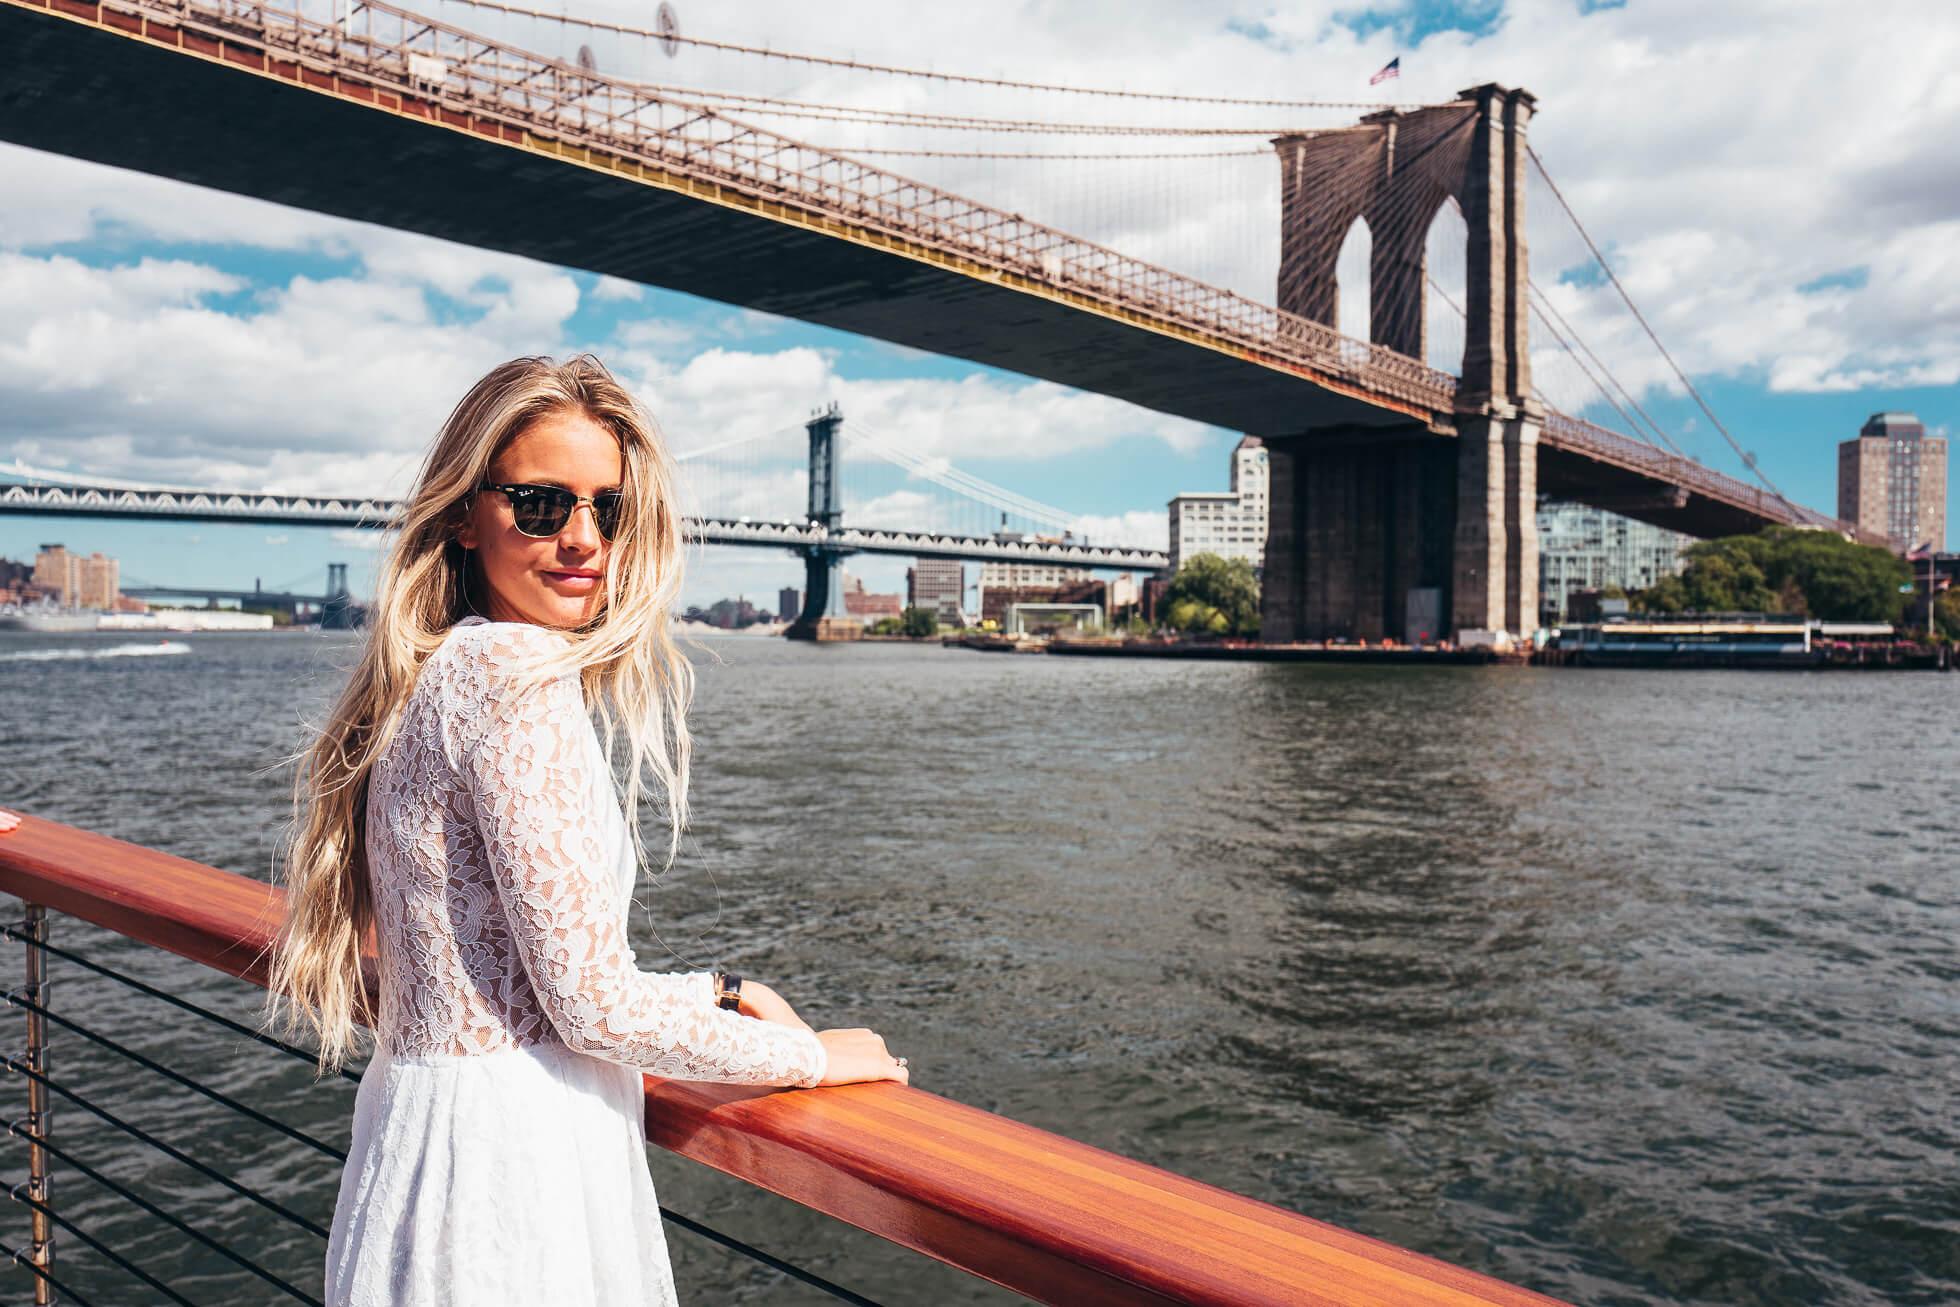 janni-deler-new-york-tour-boatL1090469